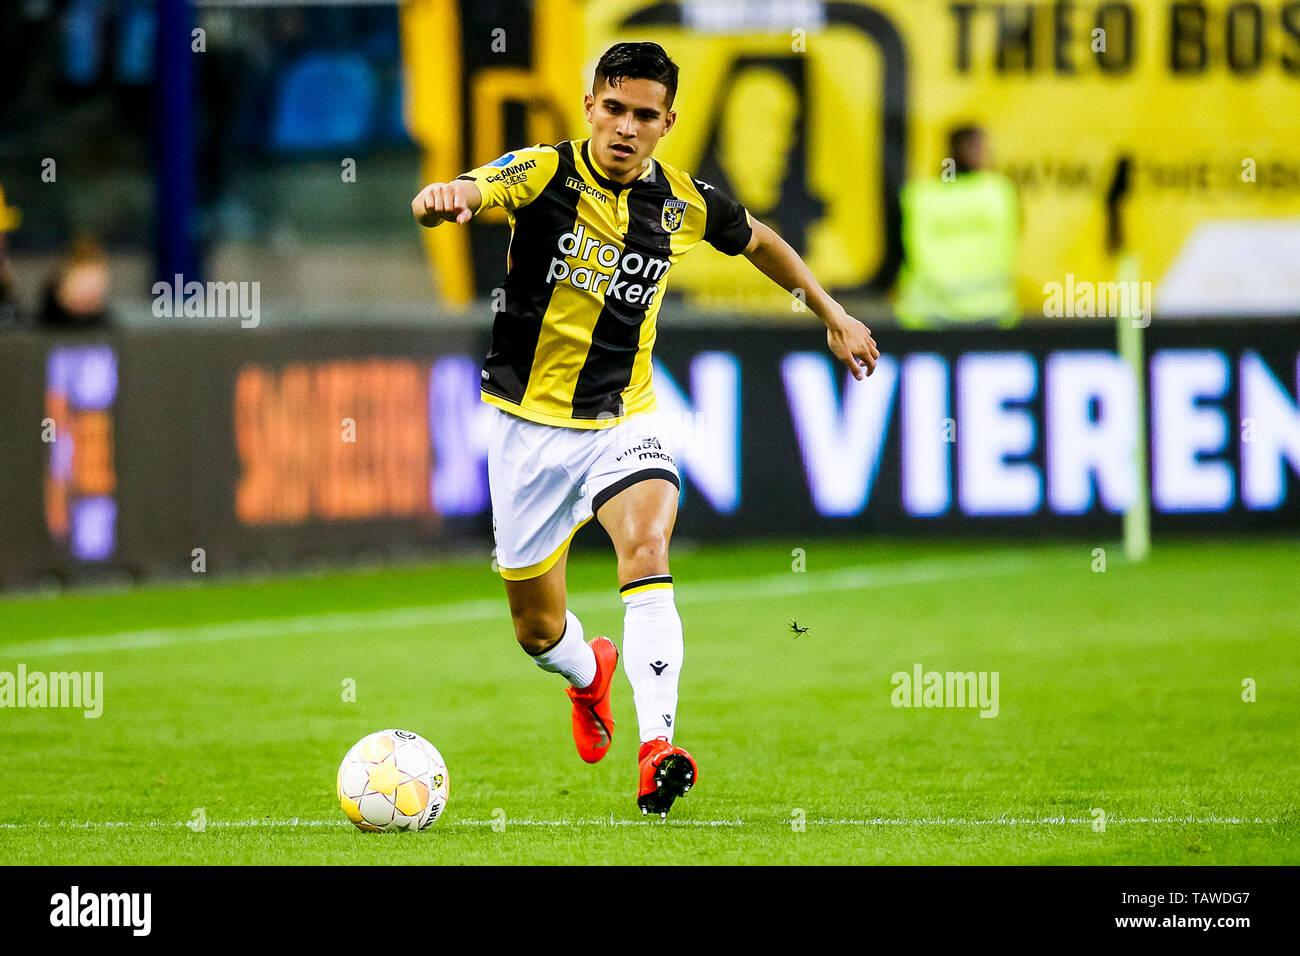 Arnhem Netherlands 28th May 2019 Arnhem Vitesse Fc Utrecht 28 05 2019 Football Dutch Eredivisie Play